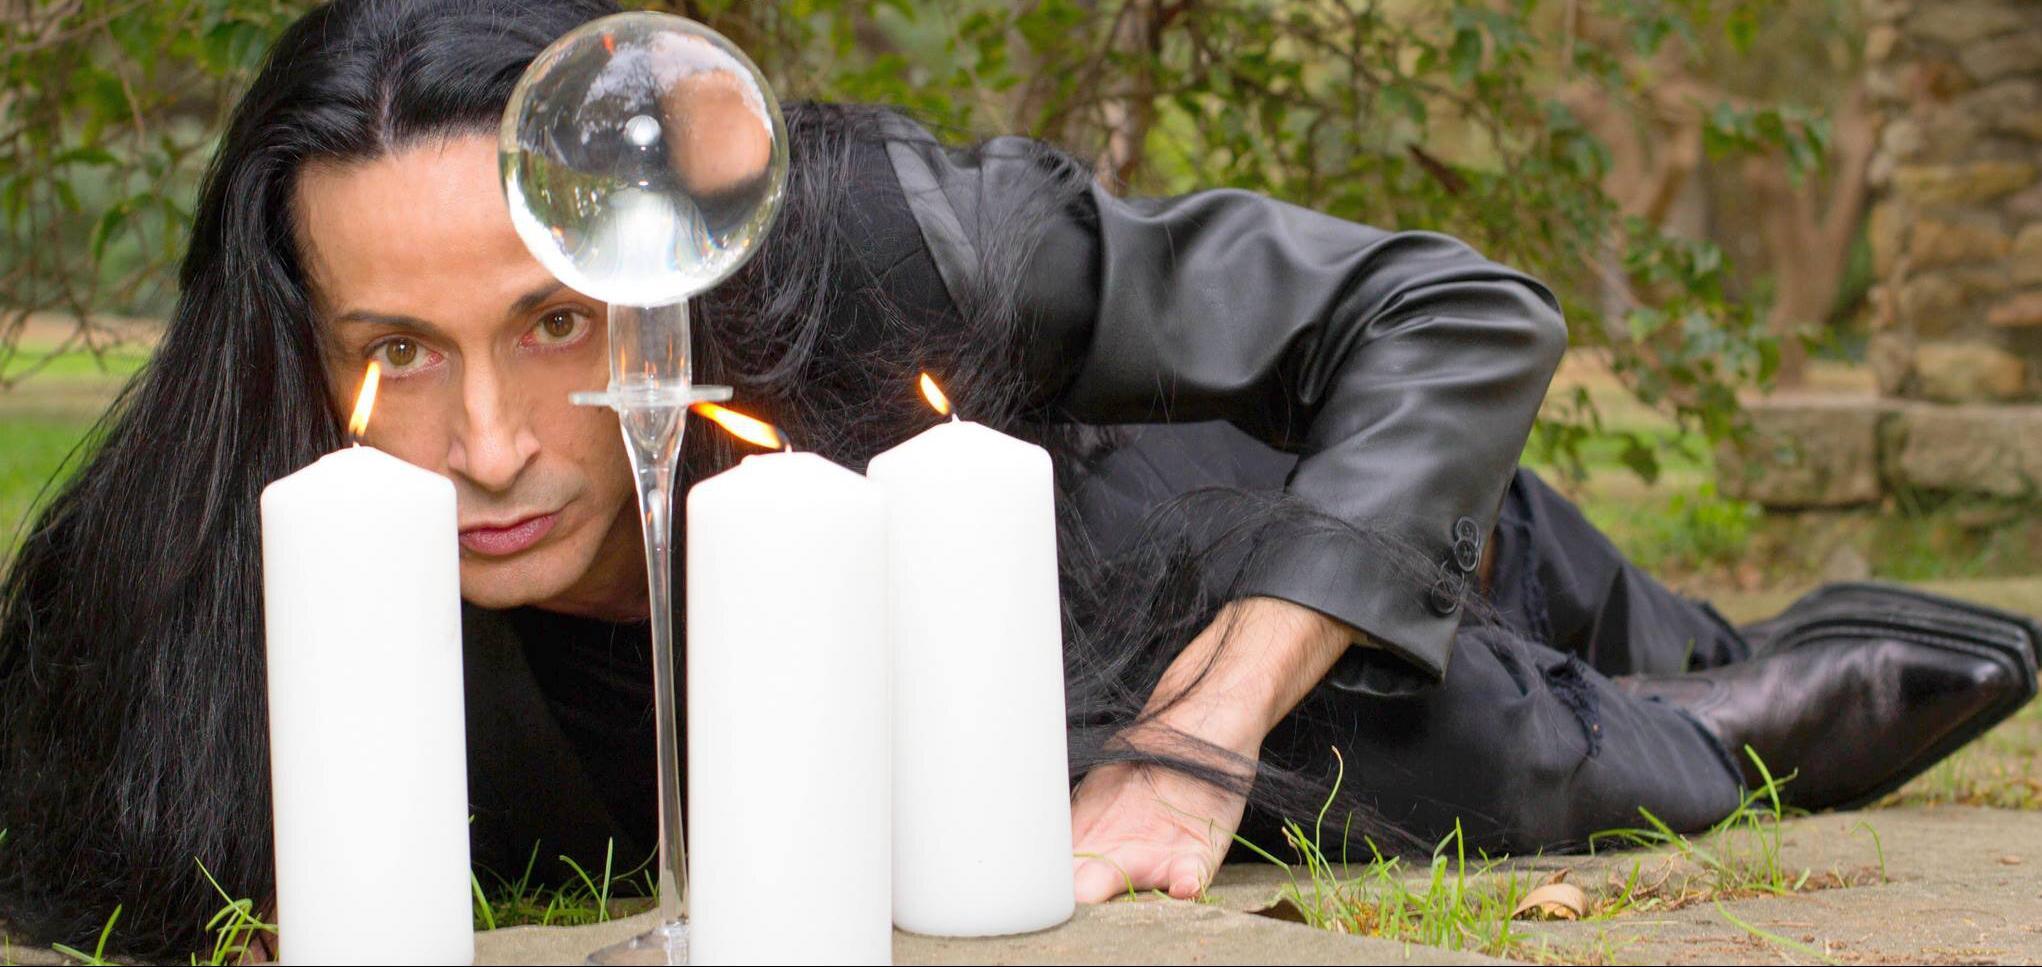 Sandro Rey predice su propia muerte